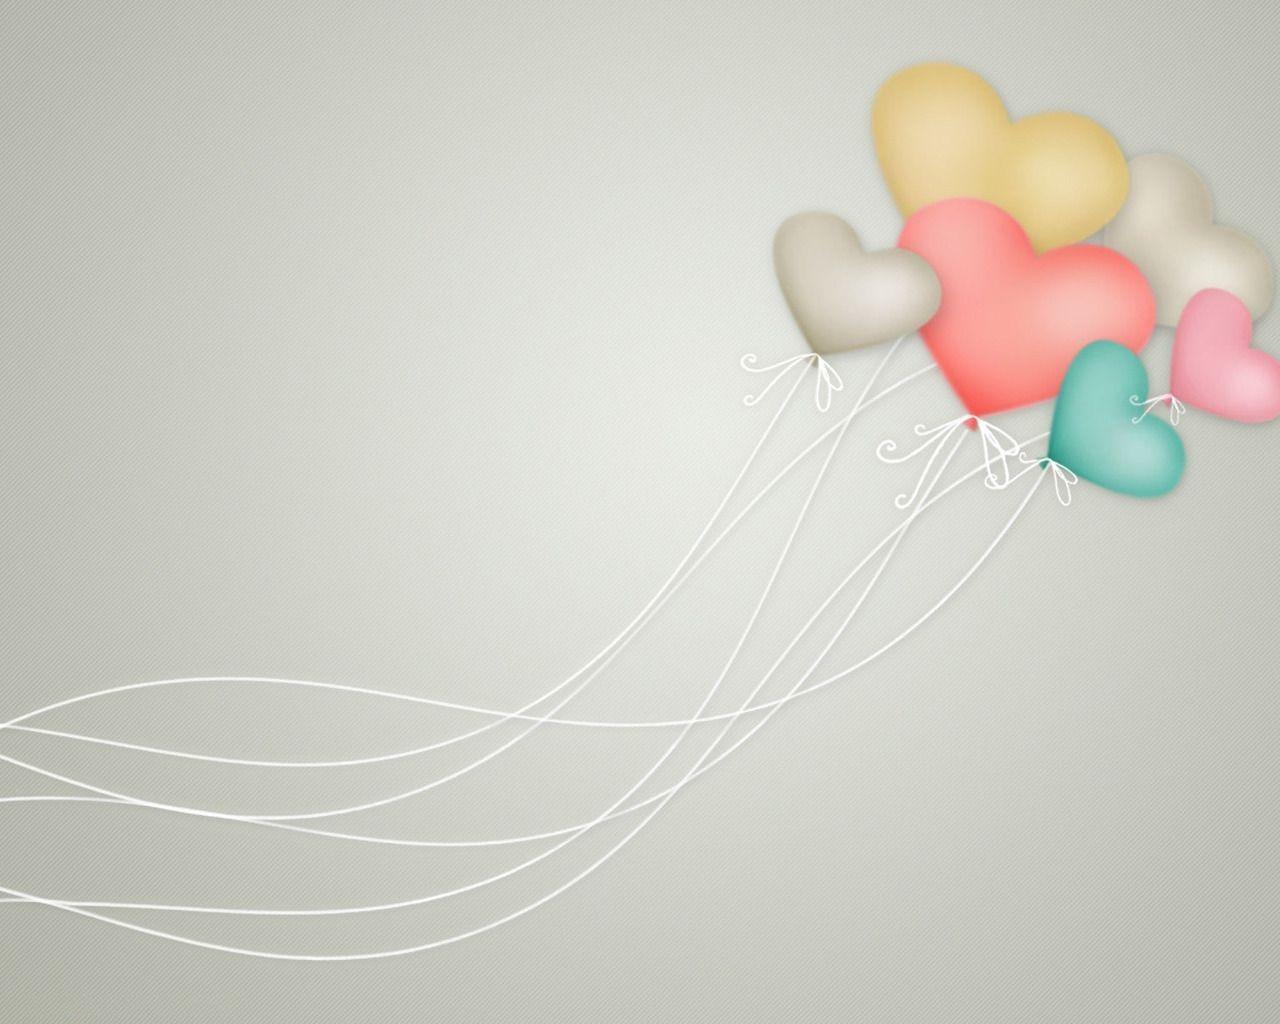 Открытки с сердечками и шариками